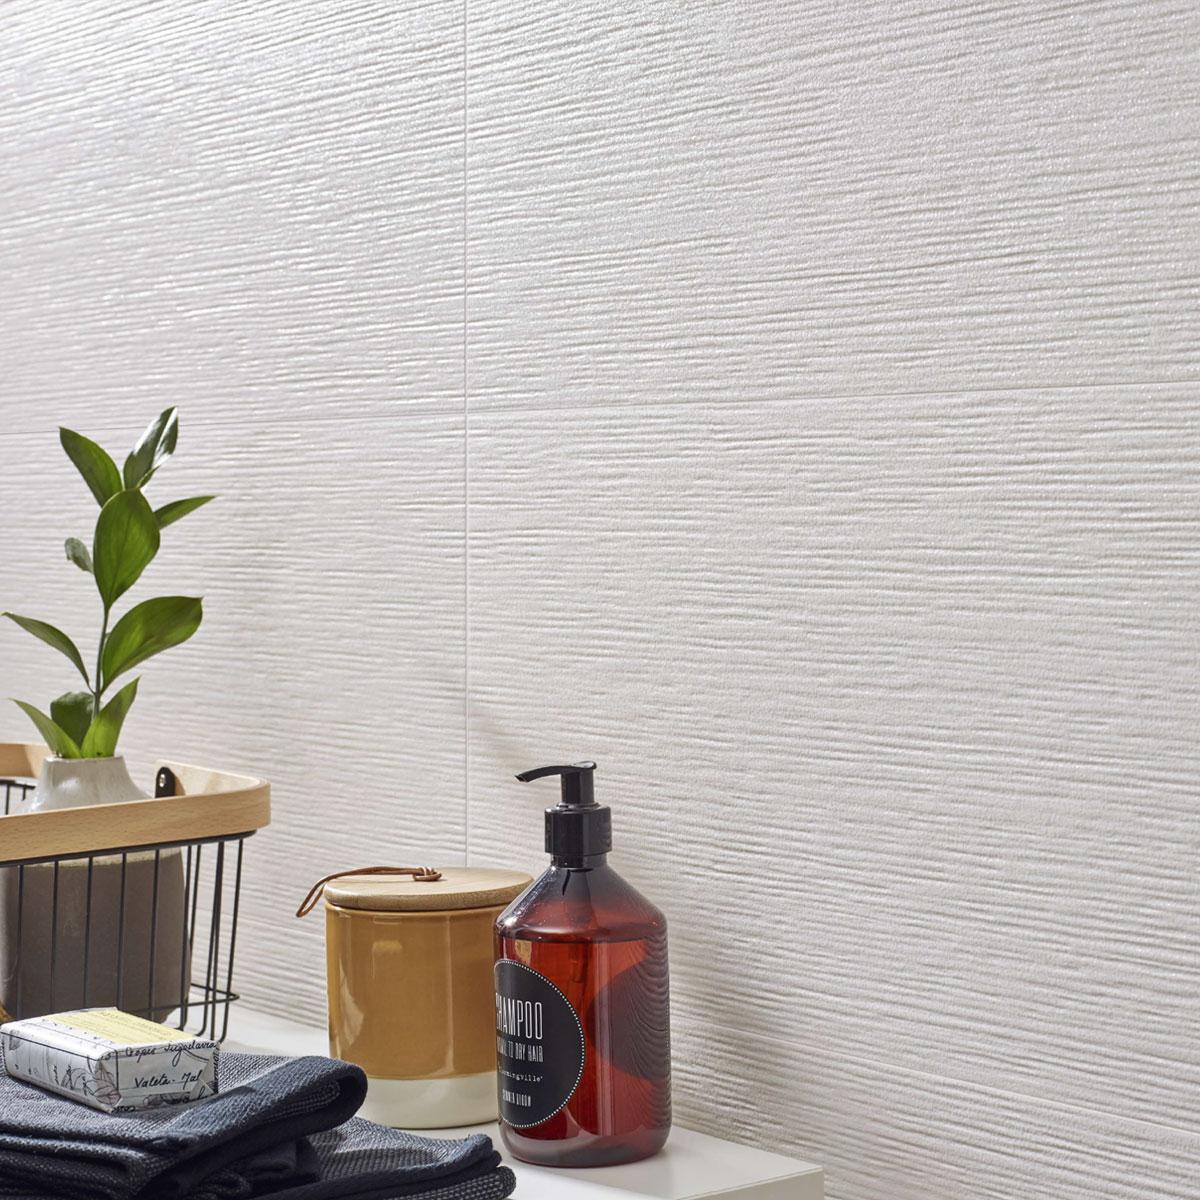 Arty - Comet White - Patterned Tiles - Stone3 Brisbane